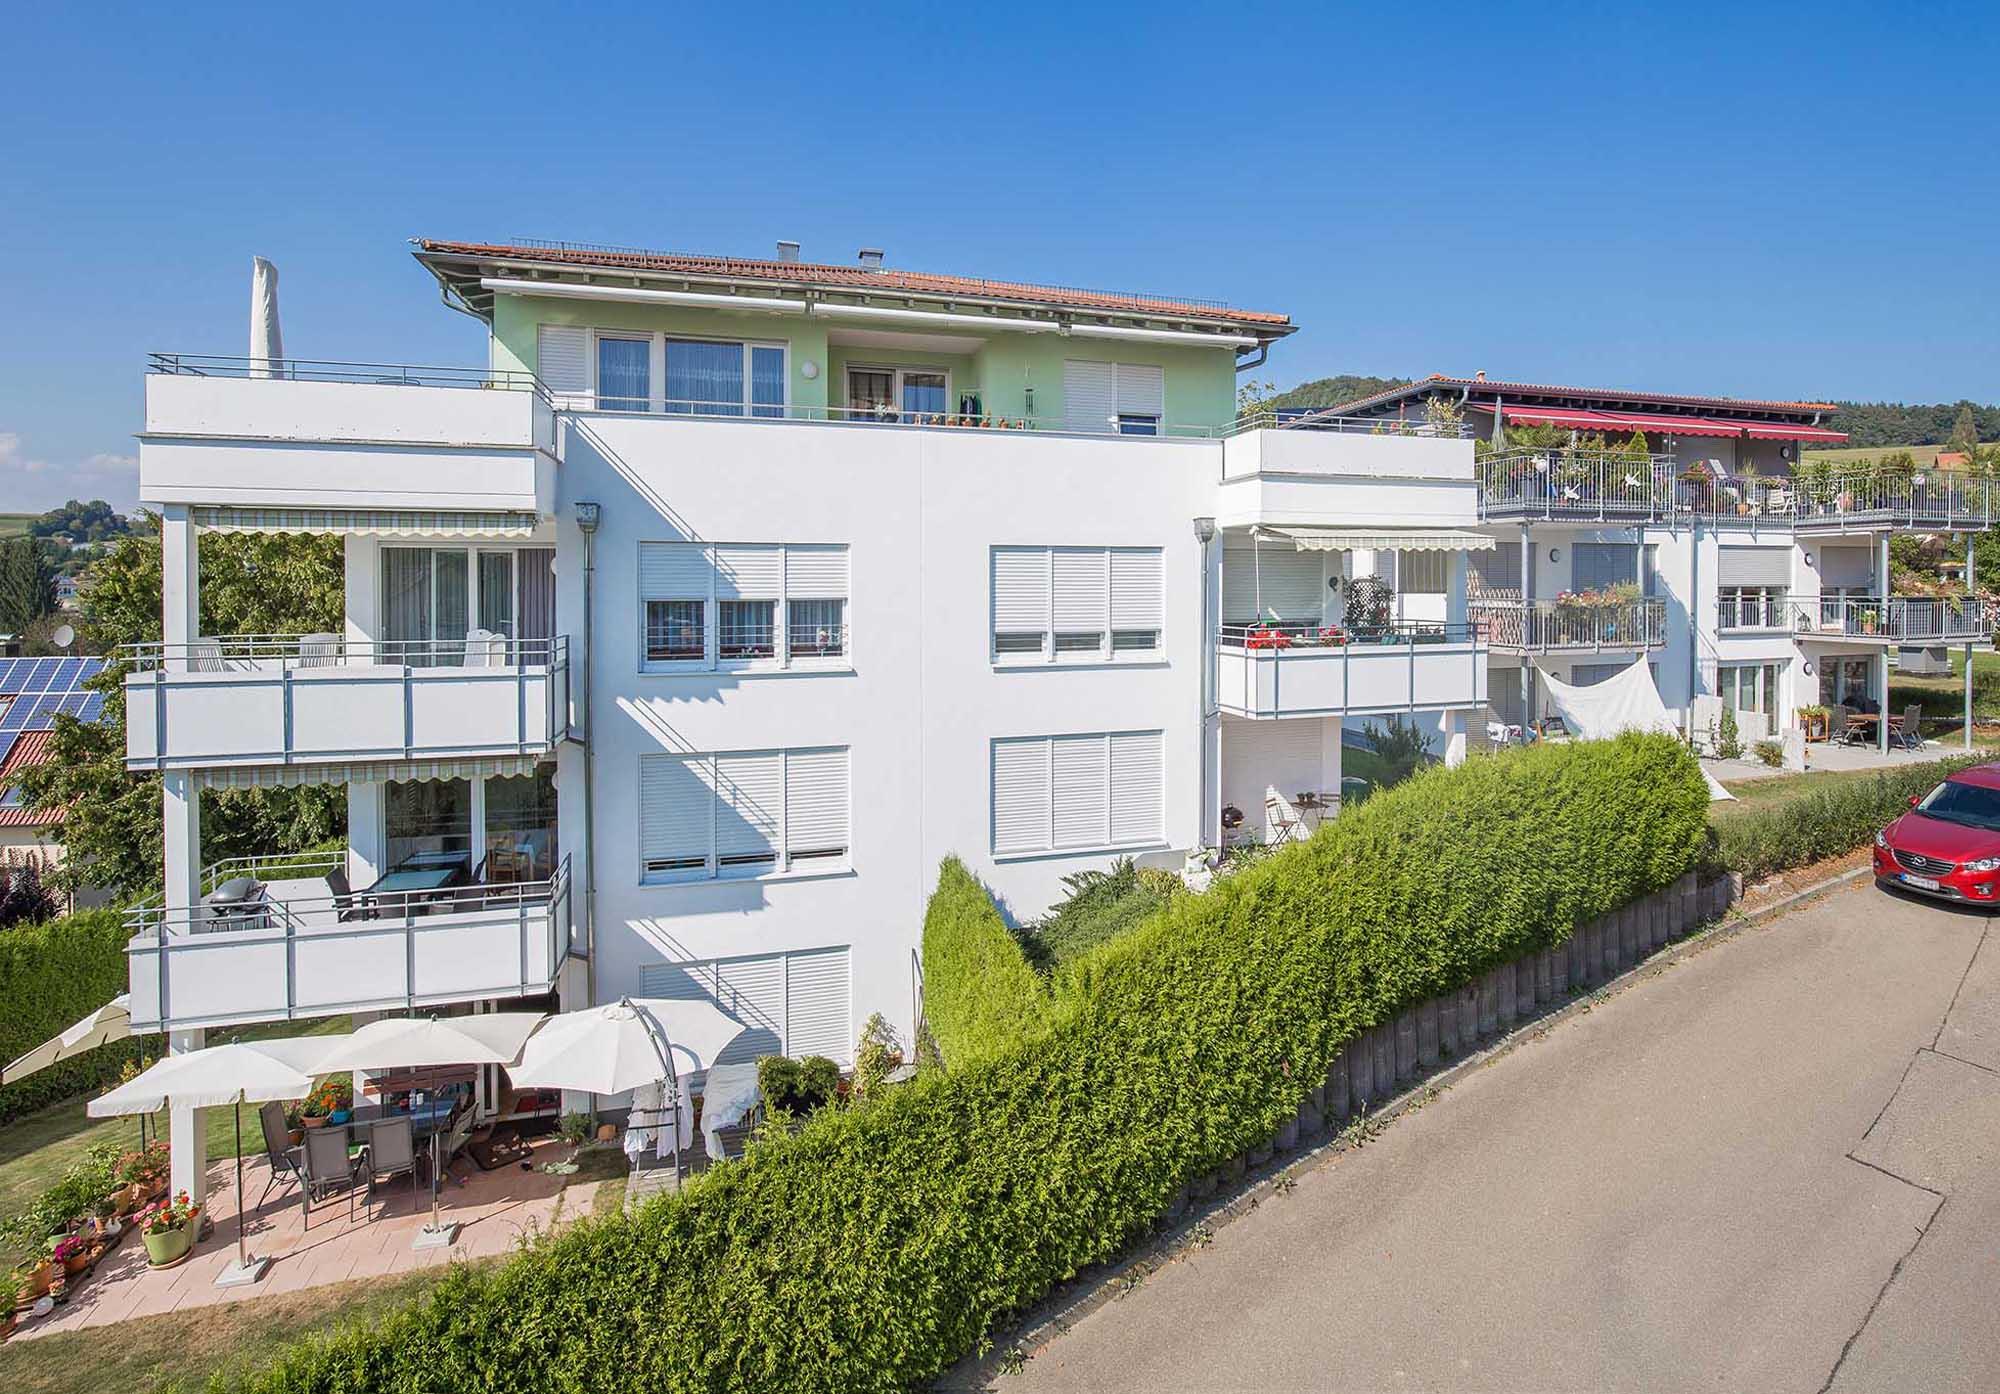 Stockach – Schlittenwiese 10-1